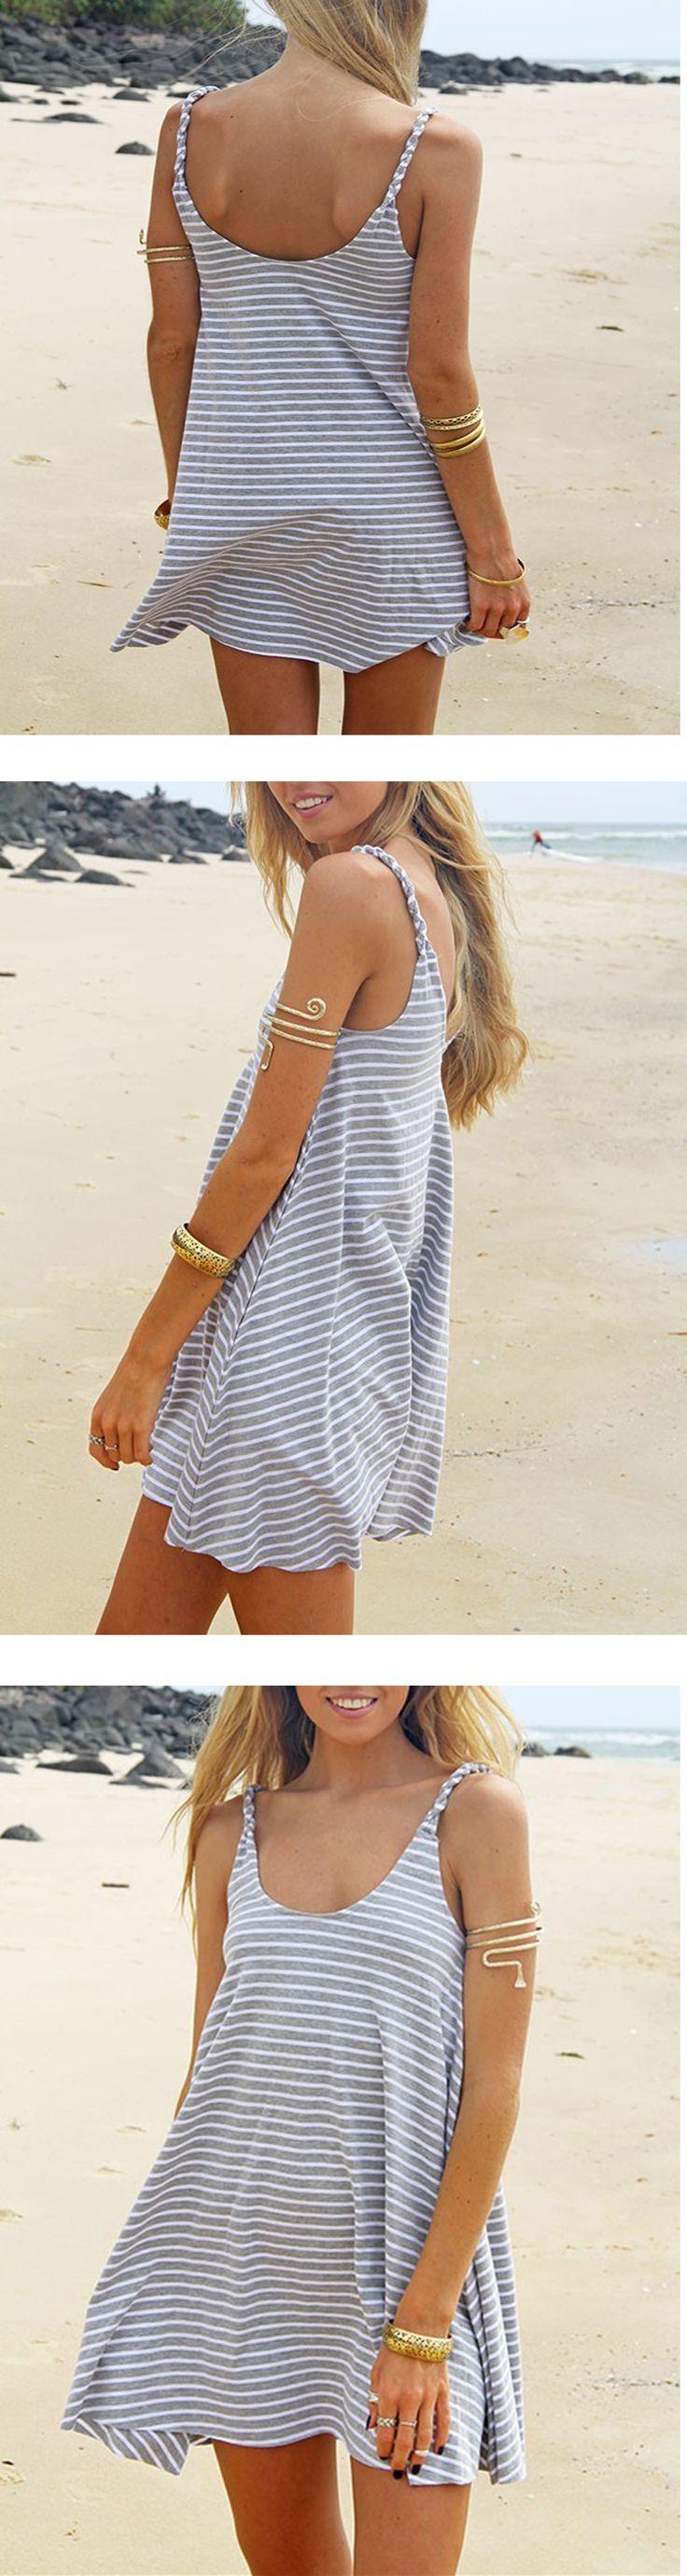 Grey Spaghetti Strap Striped Dress